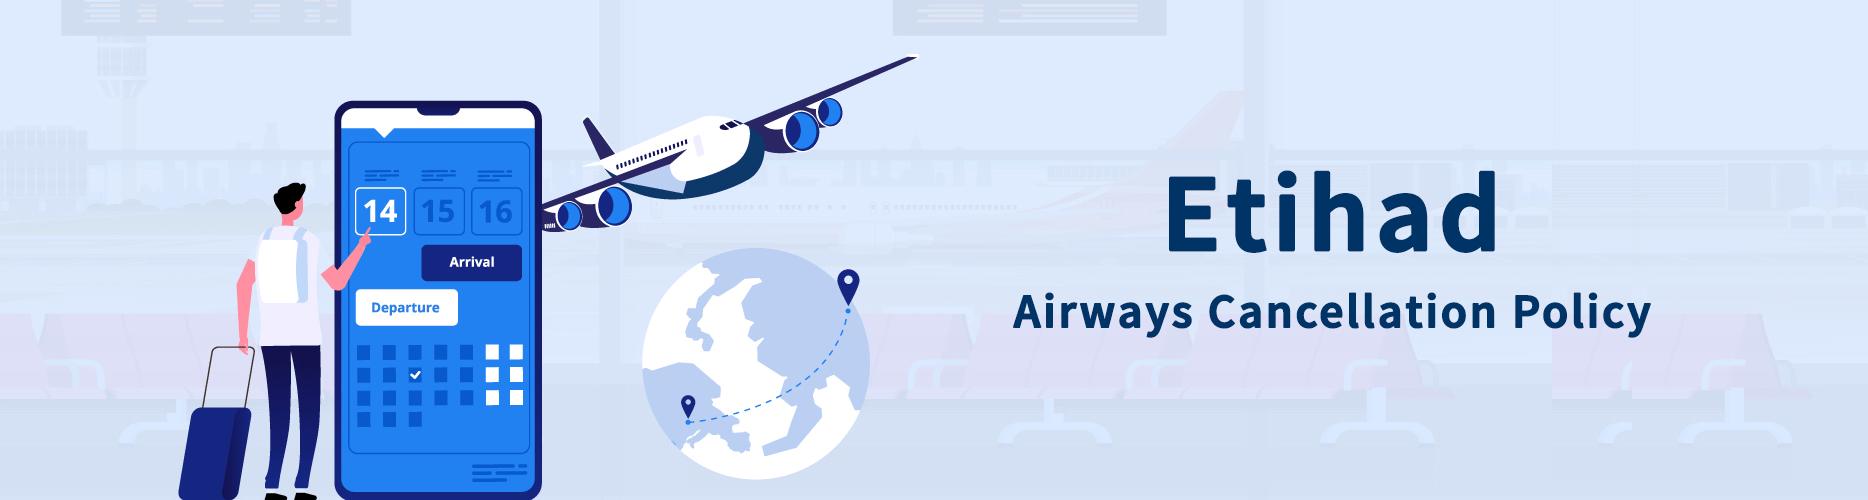 Etihad Airways Flight 24 Hours Cancellation Policy - Fee & Refund Policy